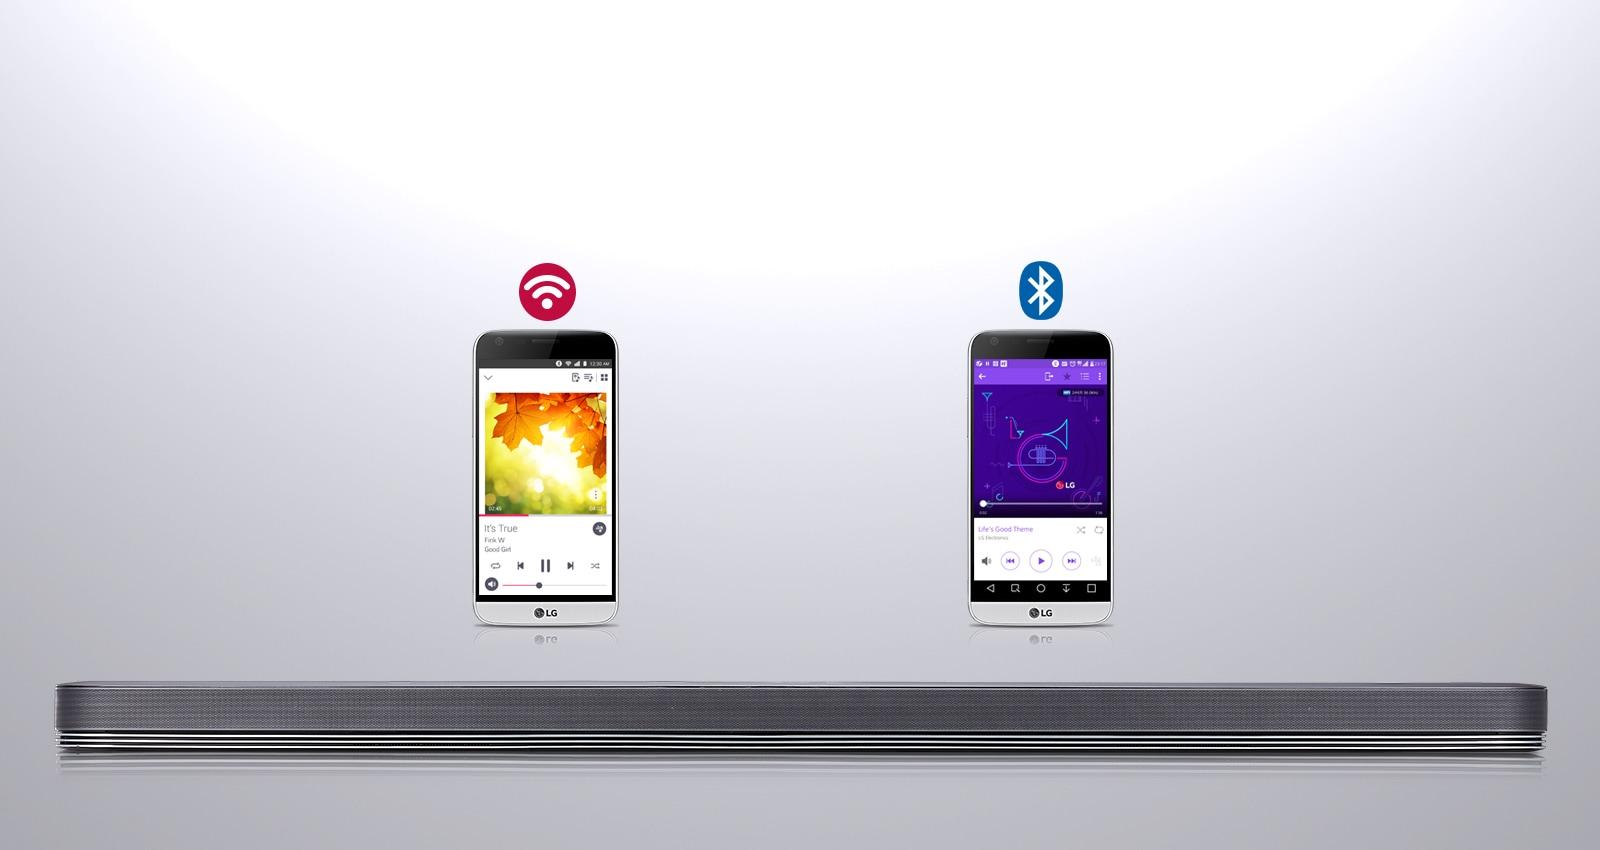 09_SJ9_Wi-Fi_Bluetooth_Compatible